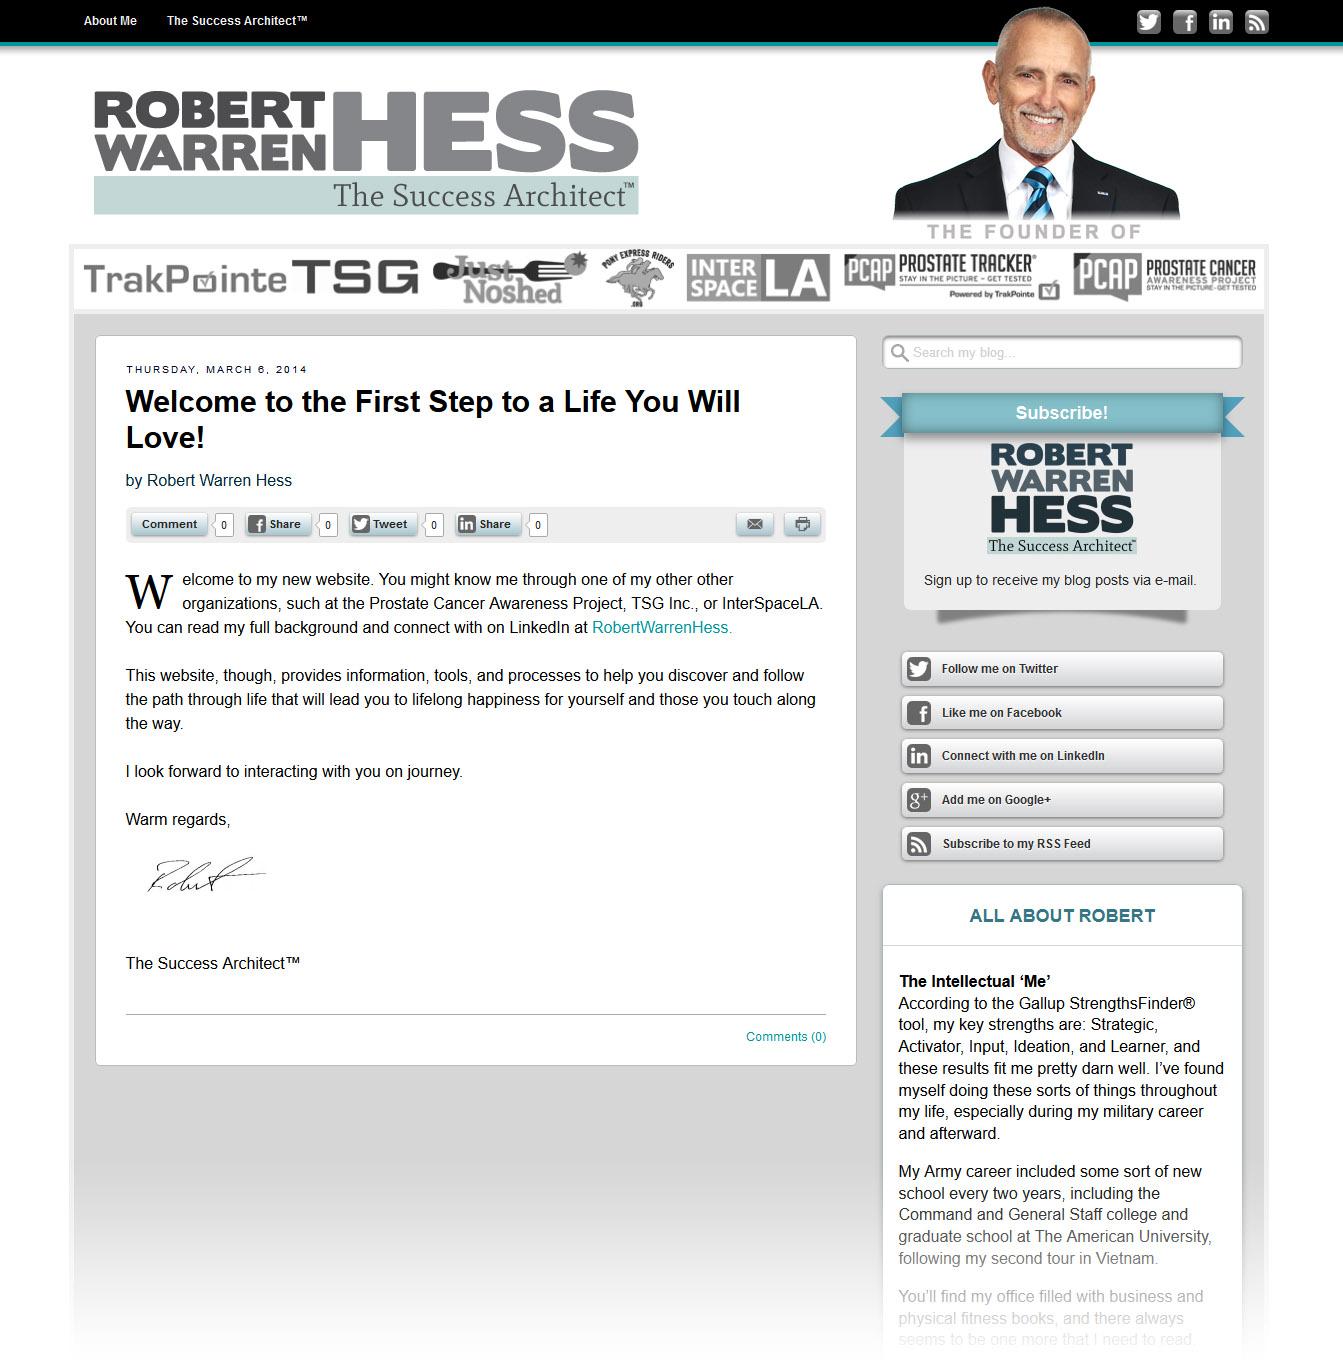 RobertWarrenHess.com Web Design and Implementation